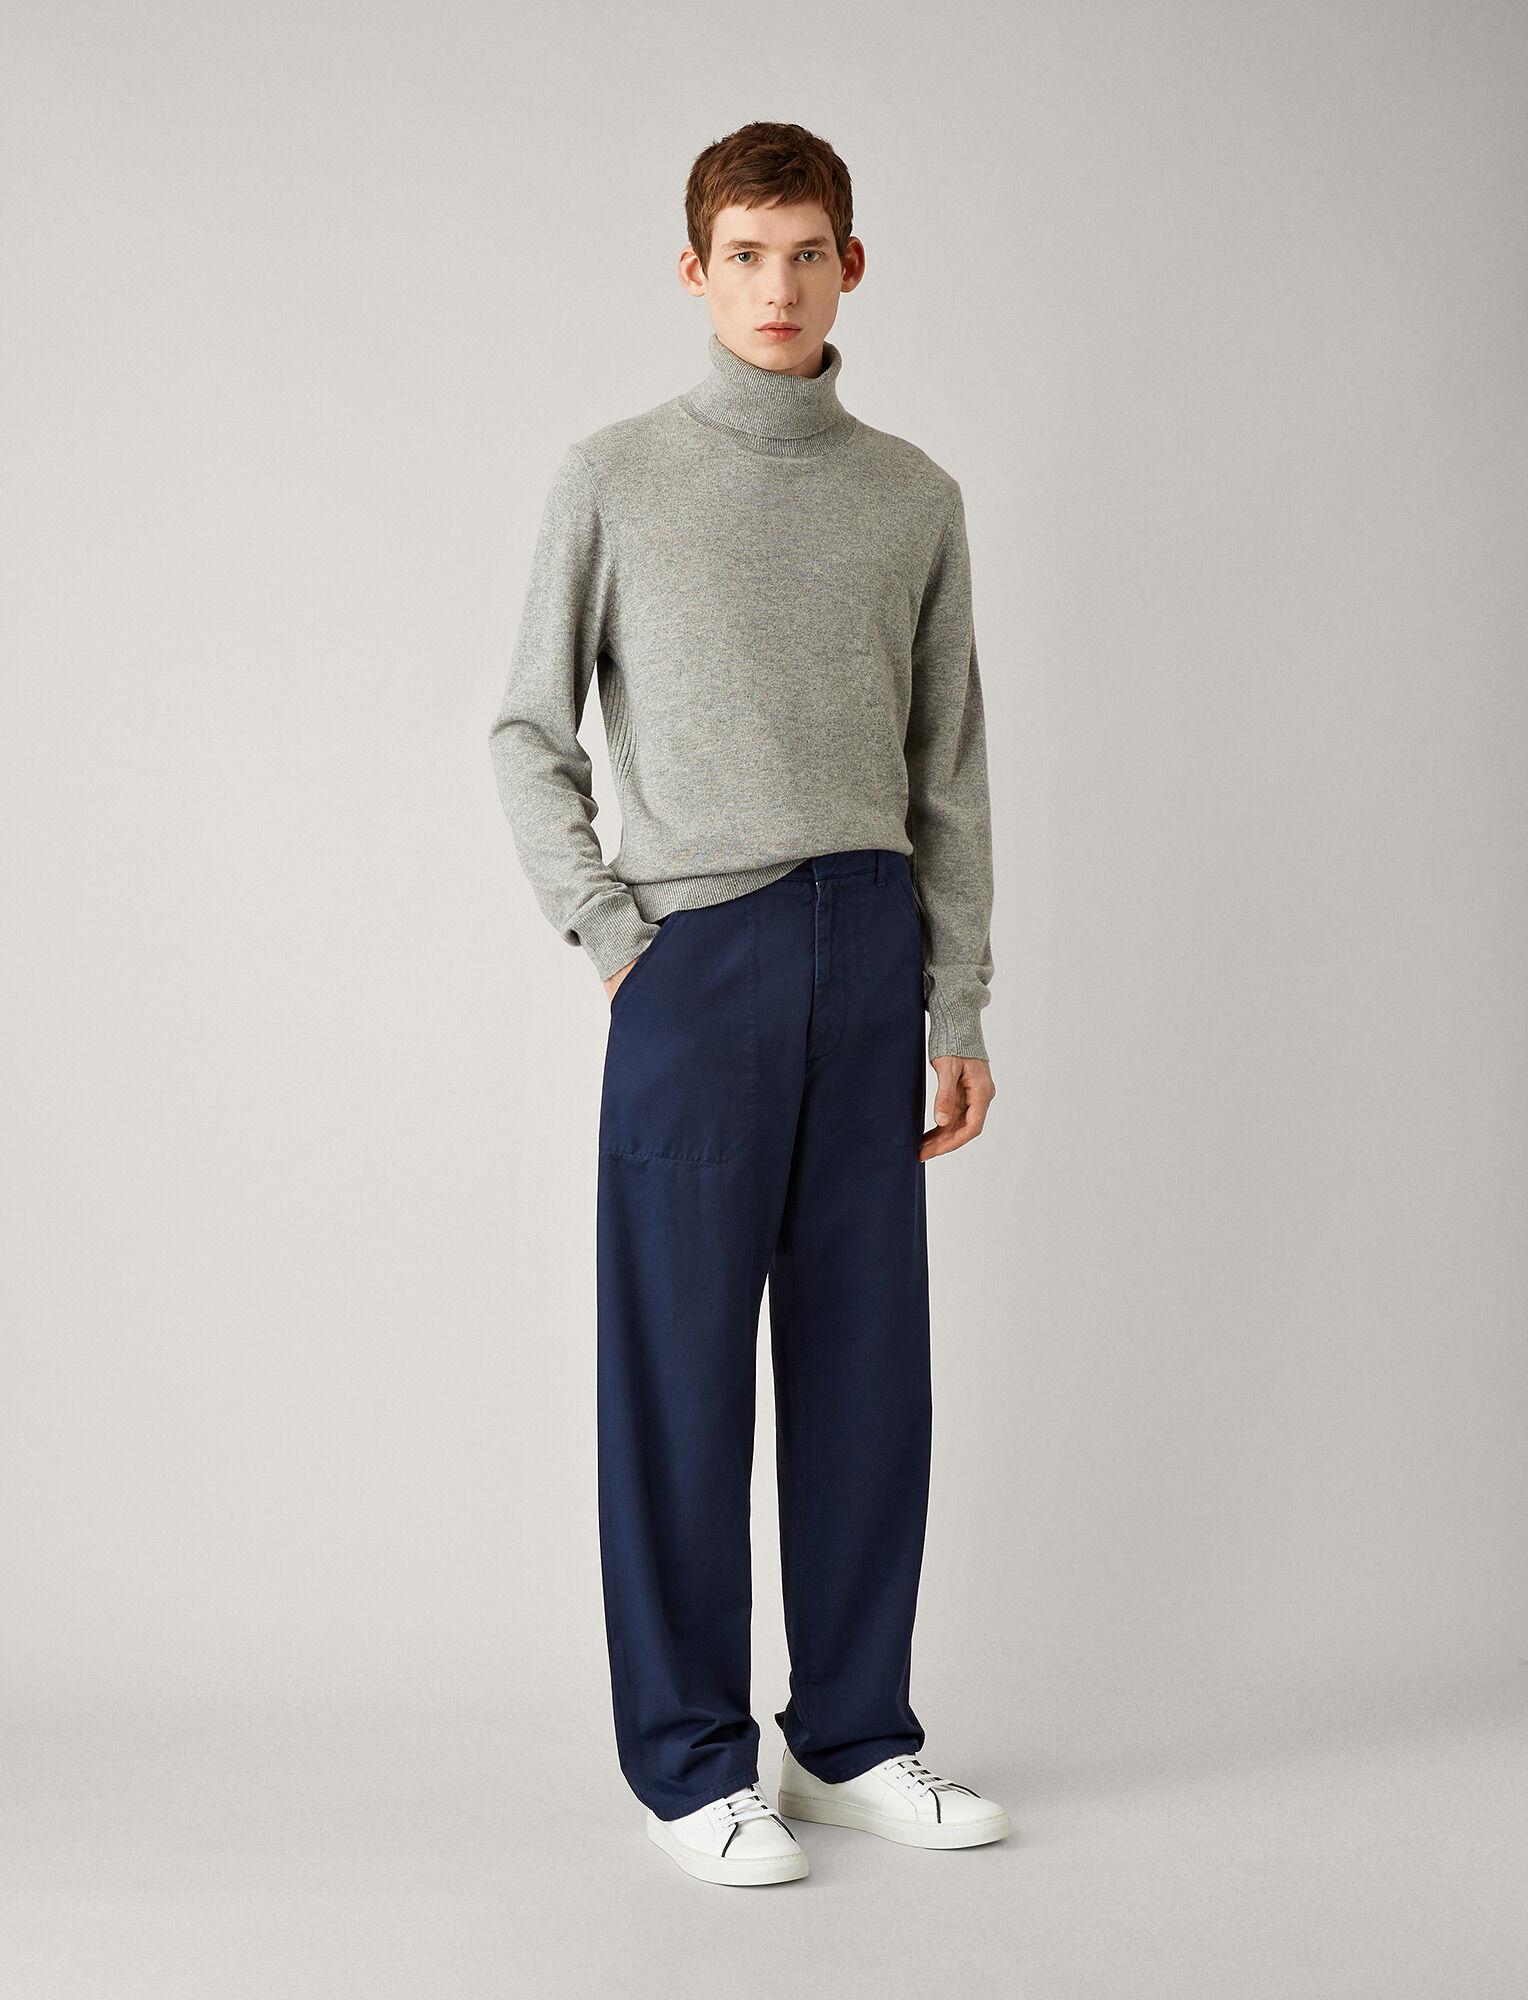 Joseph, Bridge Twill Cotton Dye Trousers, in NAVY